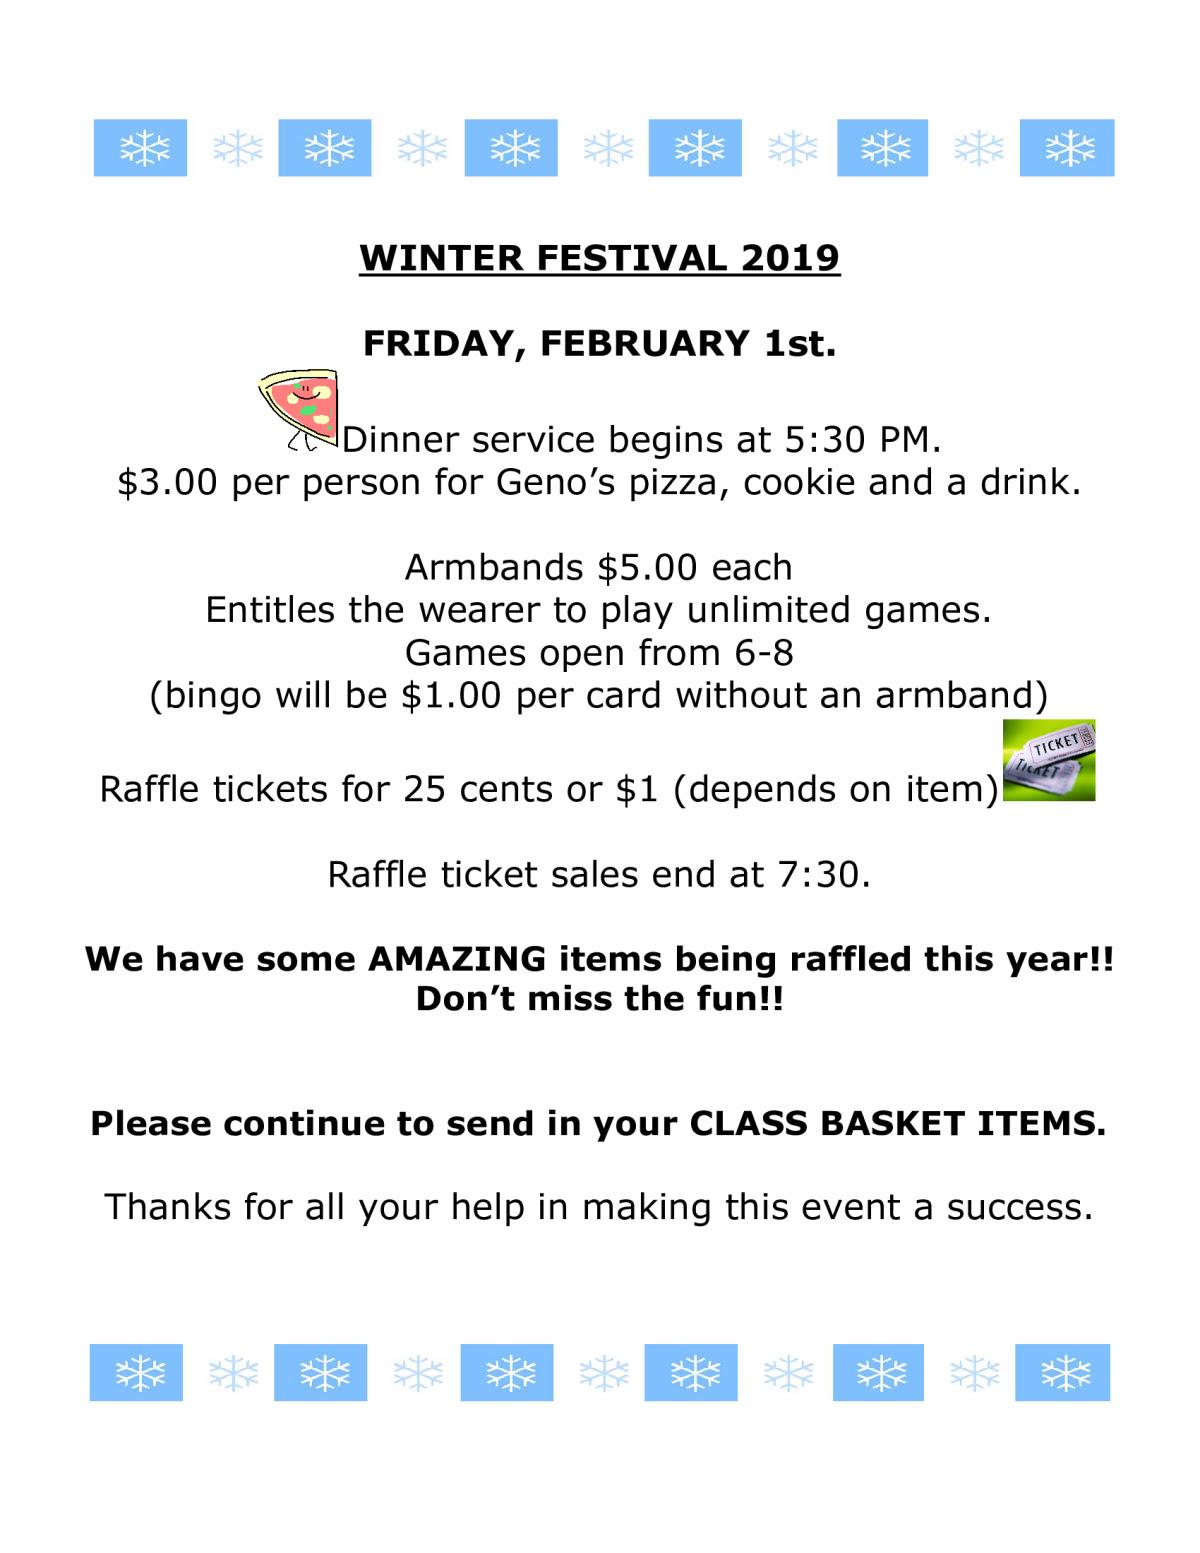 Parkview Elementary School News